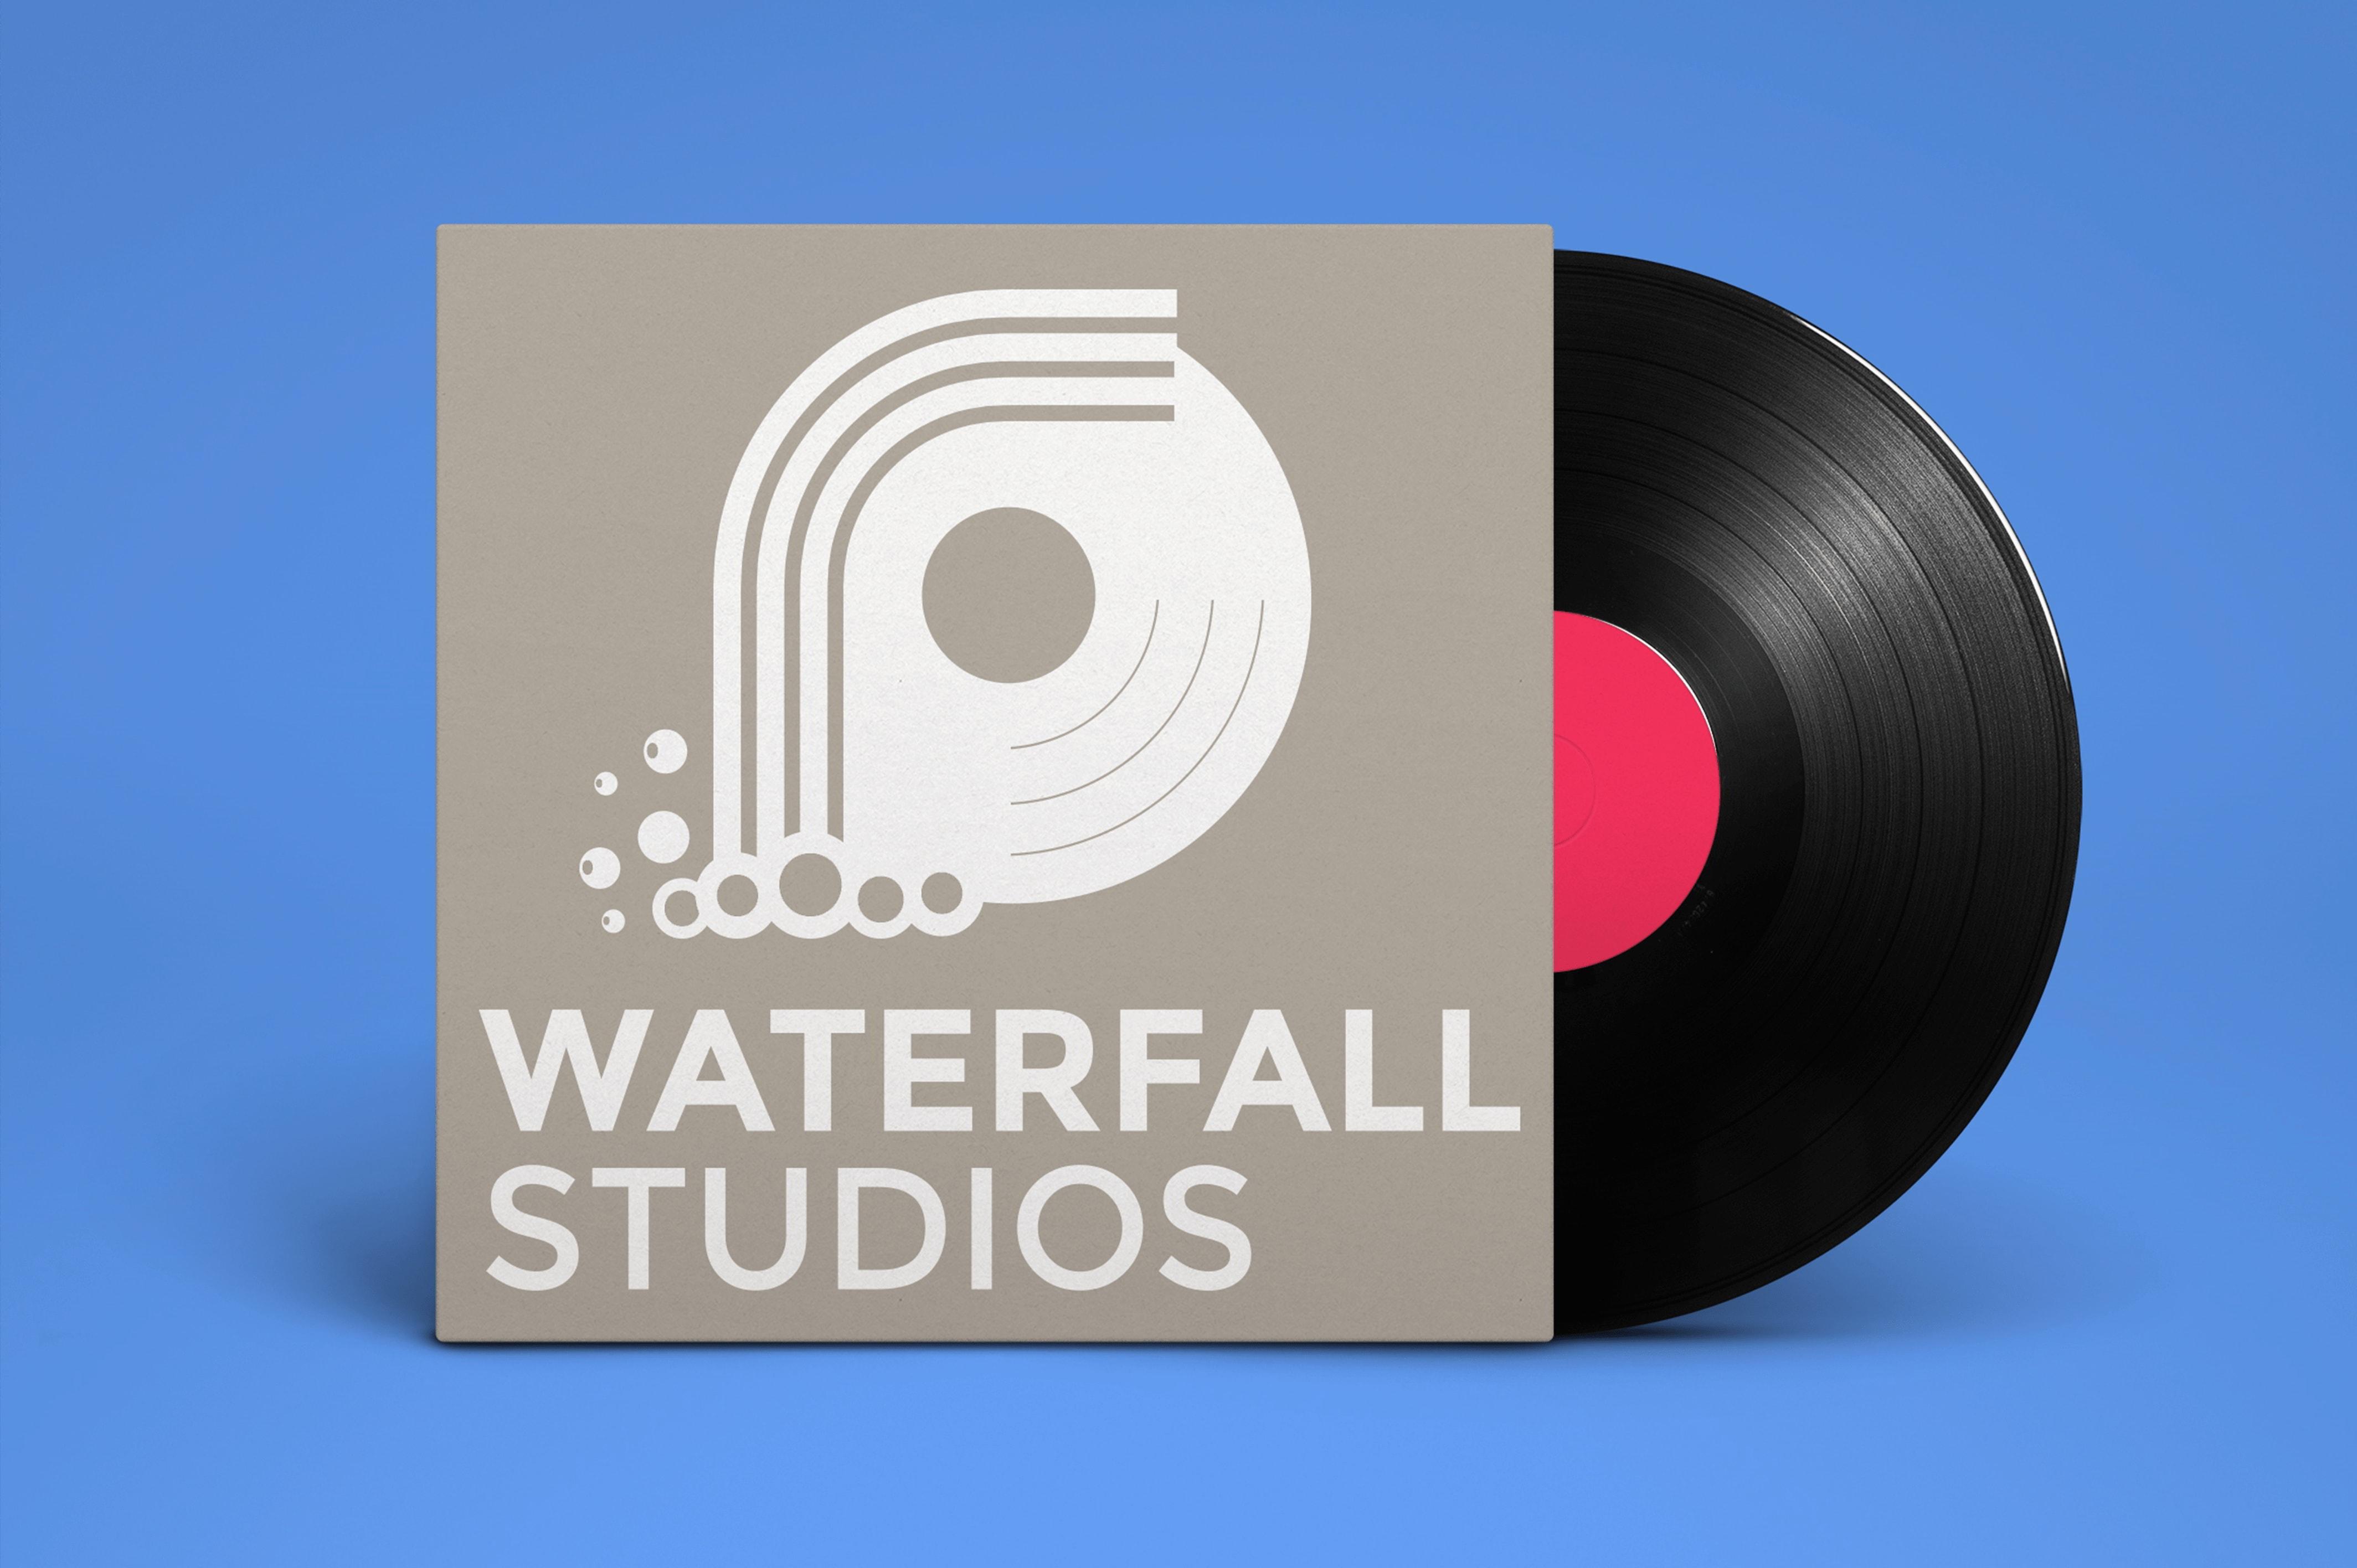 Waterfall Studios